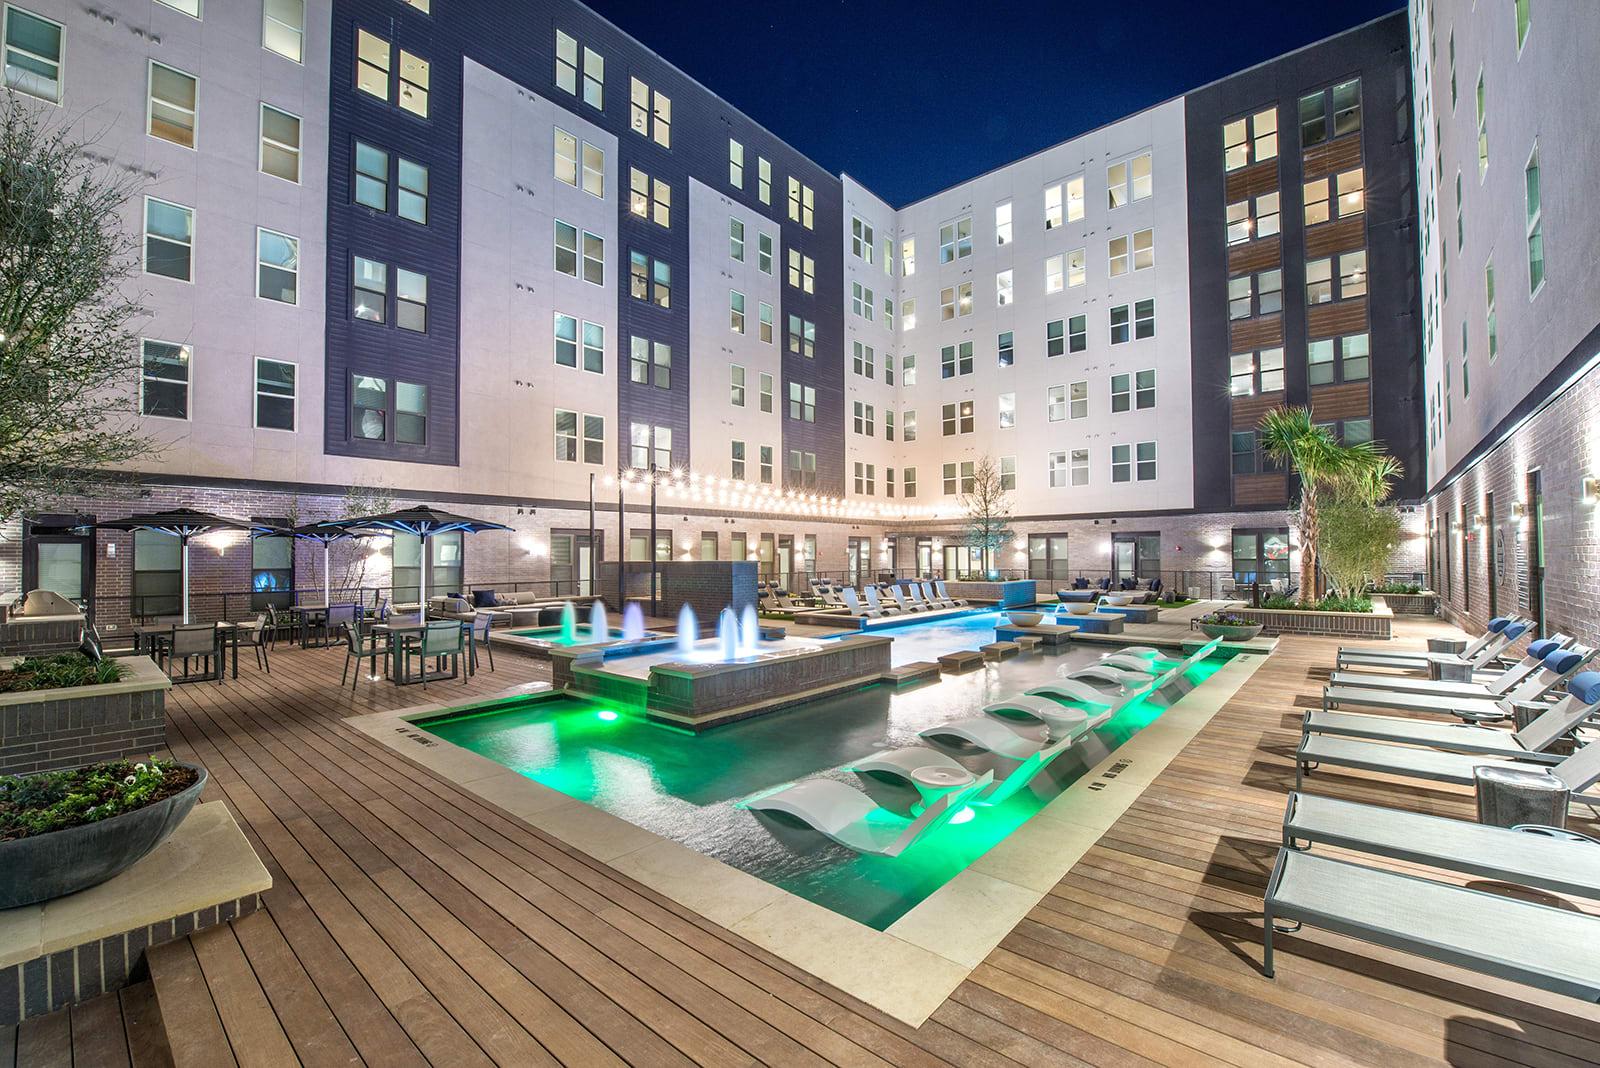 Courtyard pool at Windsor Turtle Creek, Dallas, TX